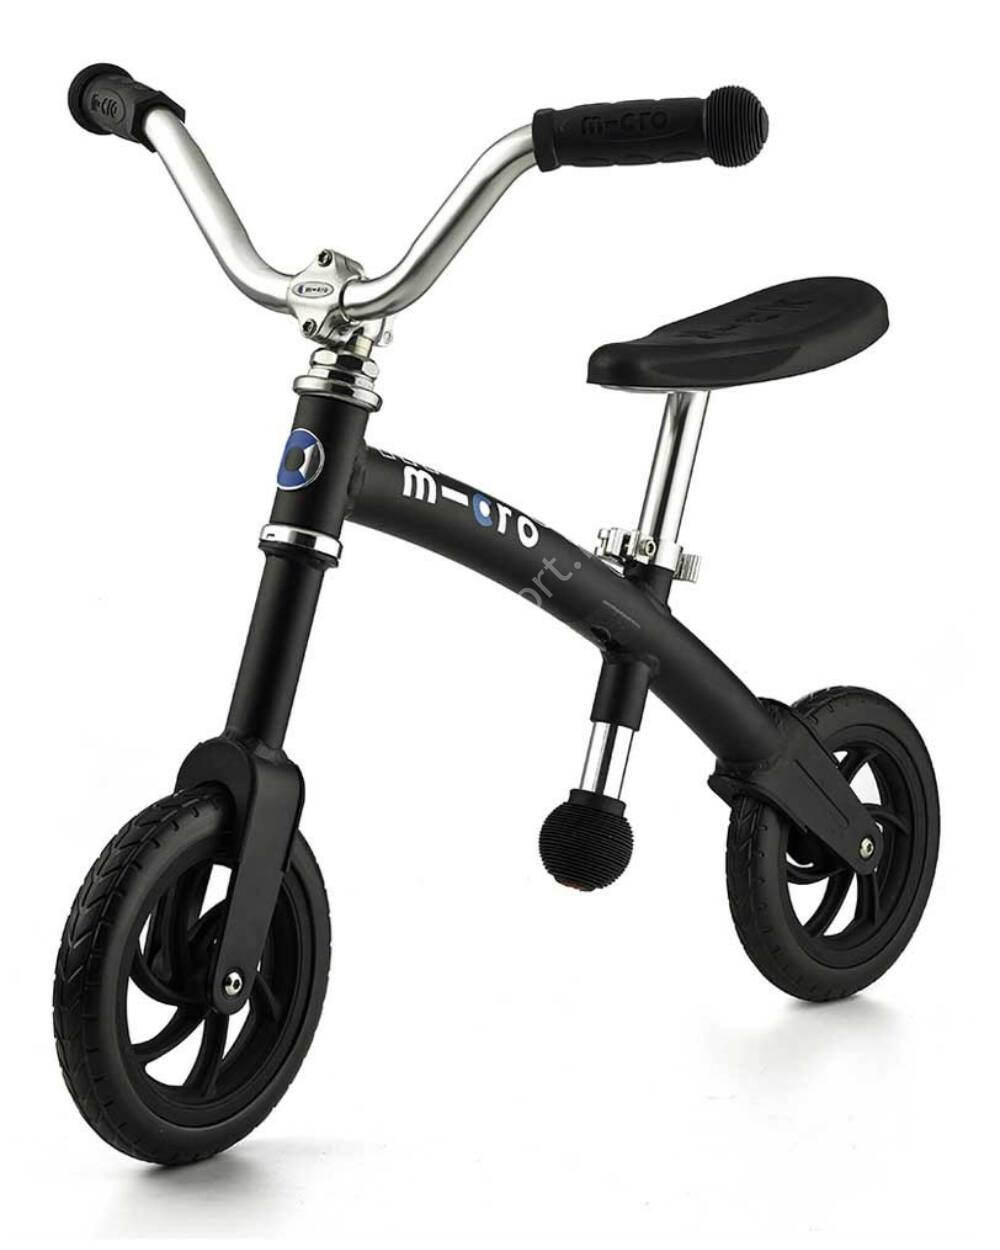 G-Bike Micro Chopper futóbicikli, fekete